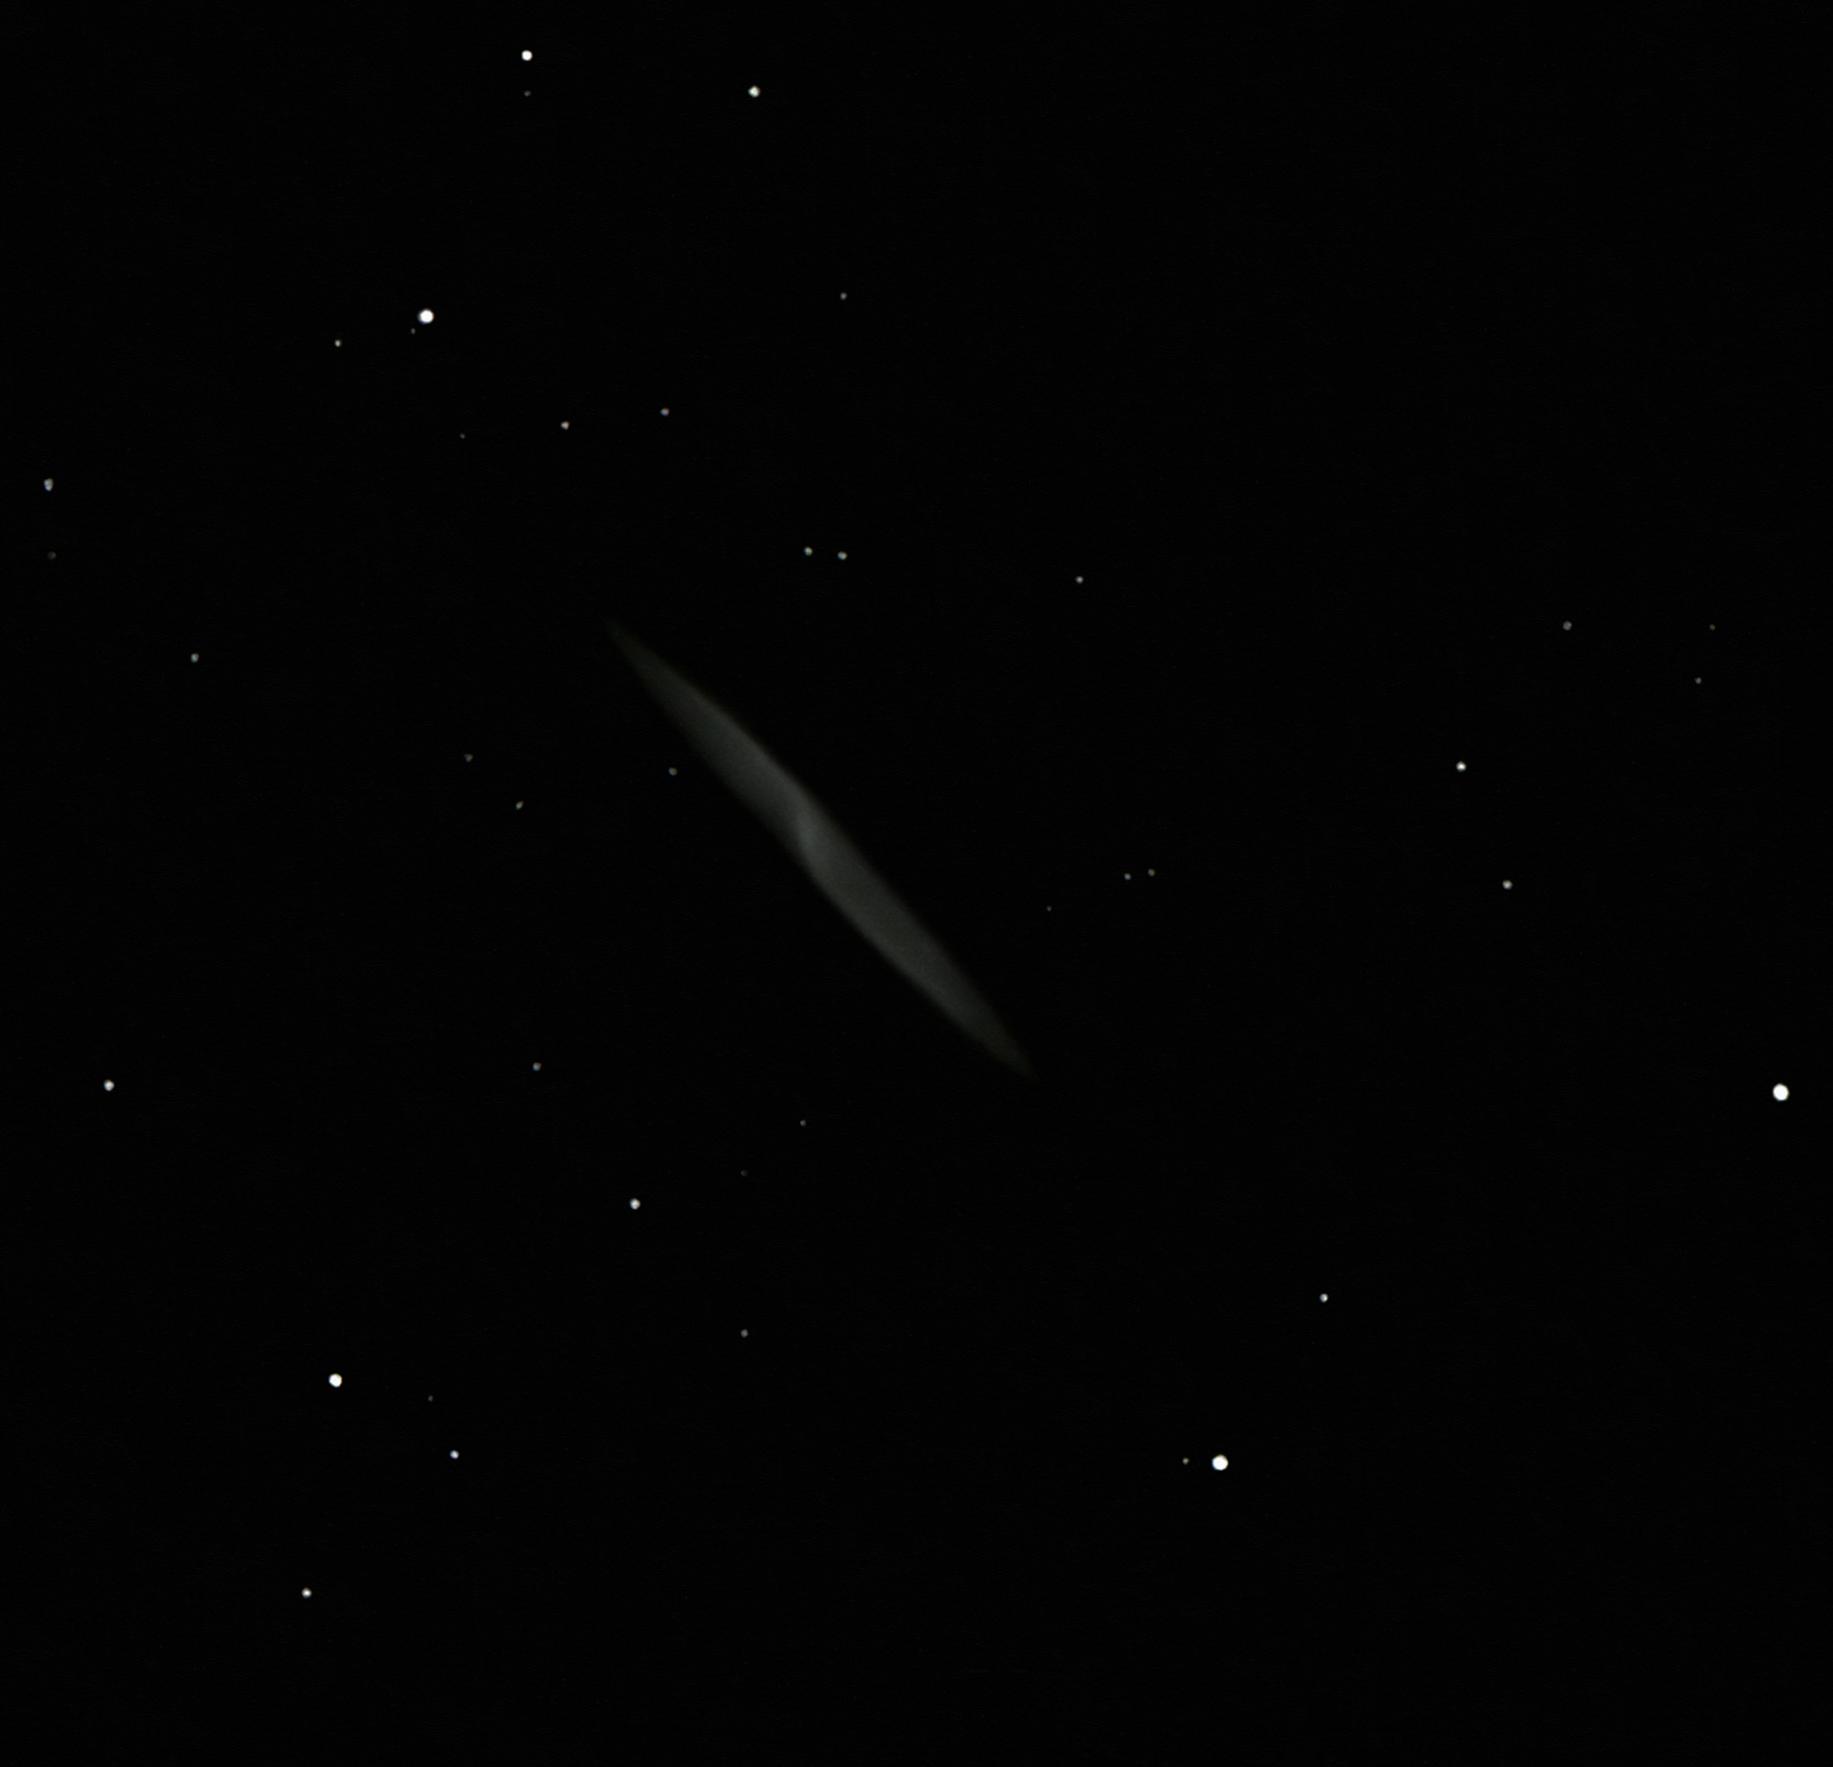 ngc 4945 galaxy